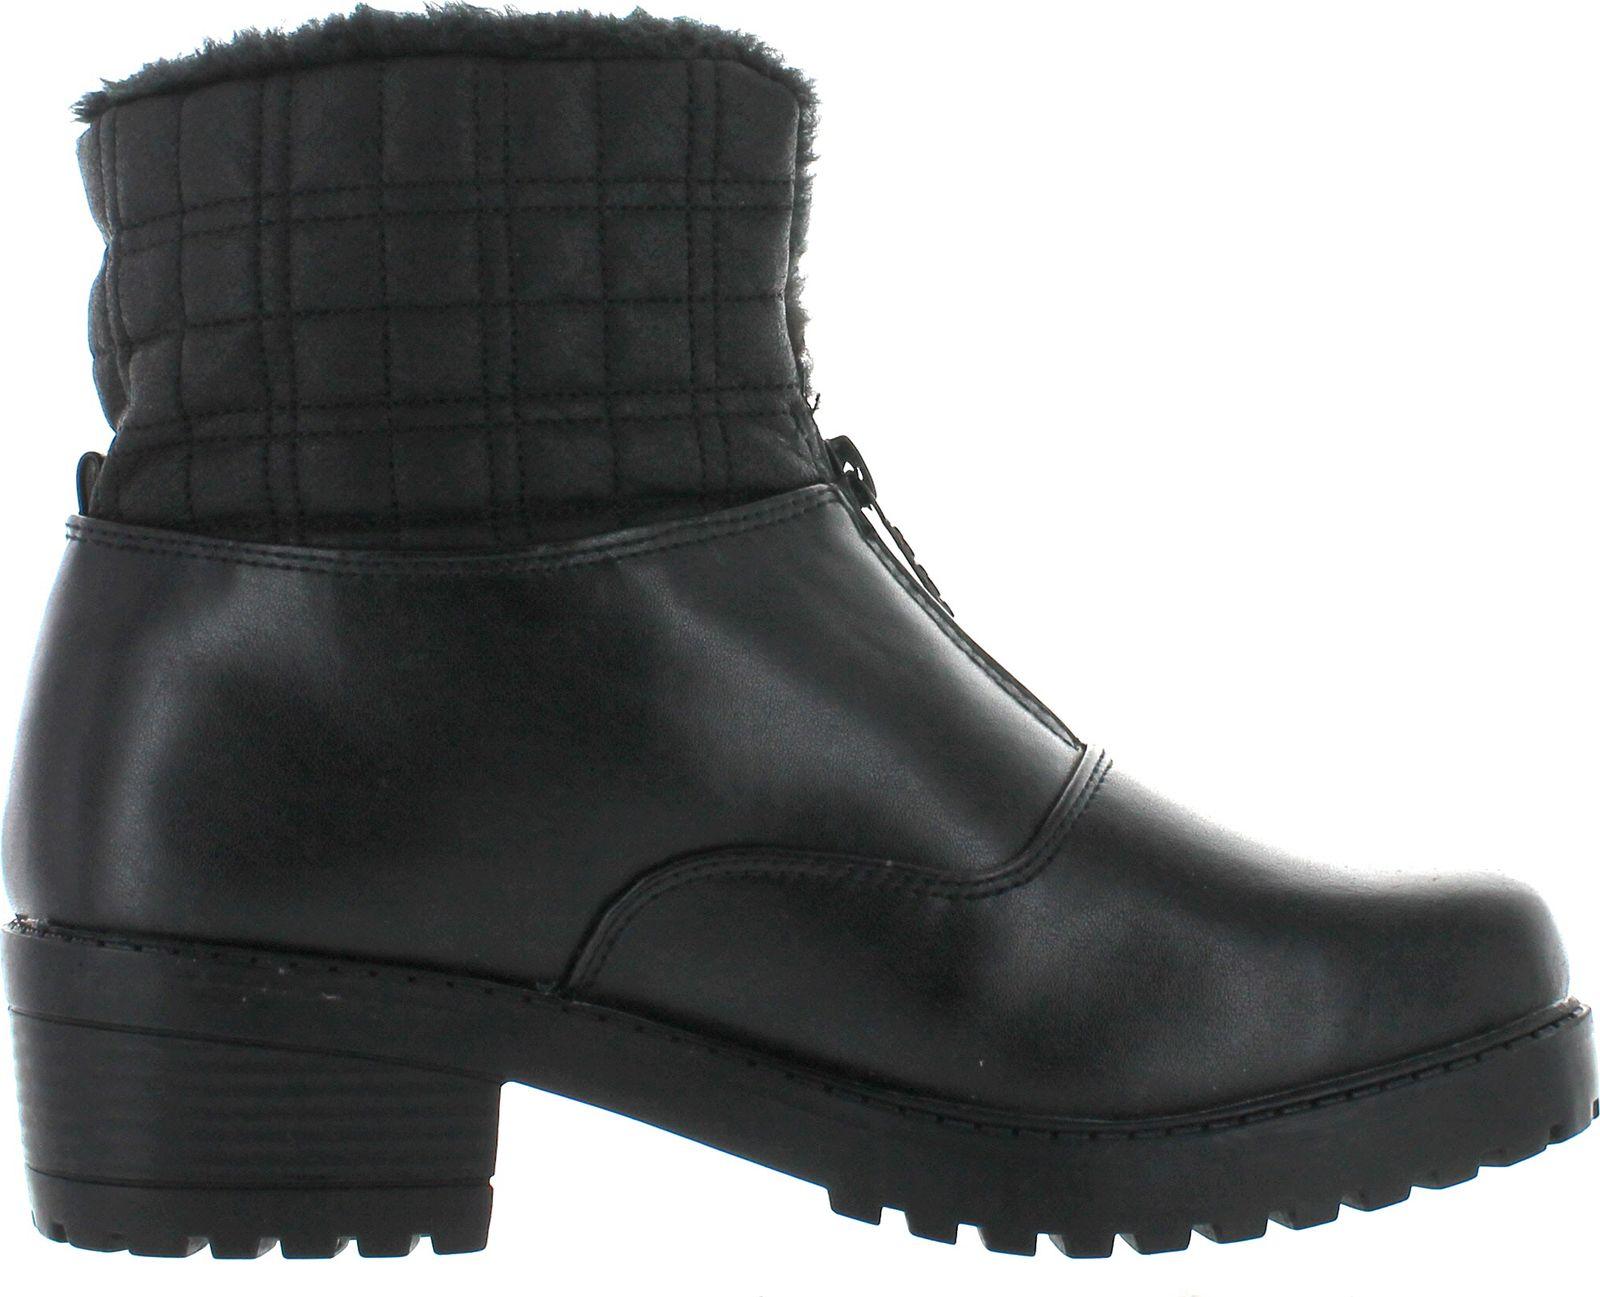 Totes Womens Zippy3 Waterproof Winter Boots   eBay